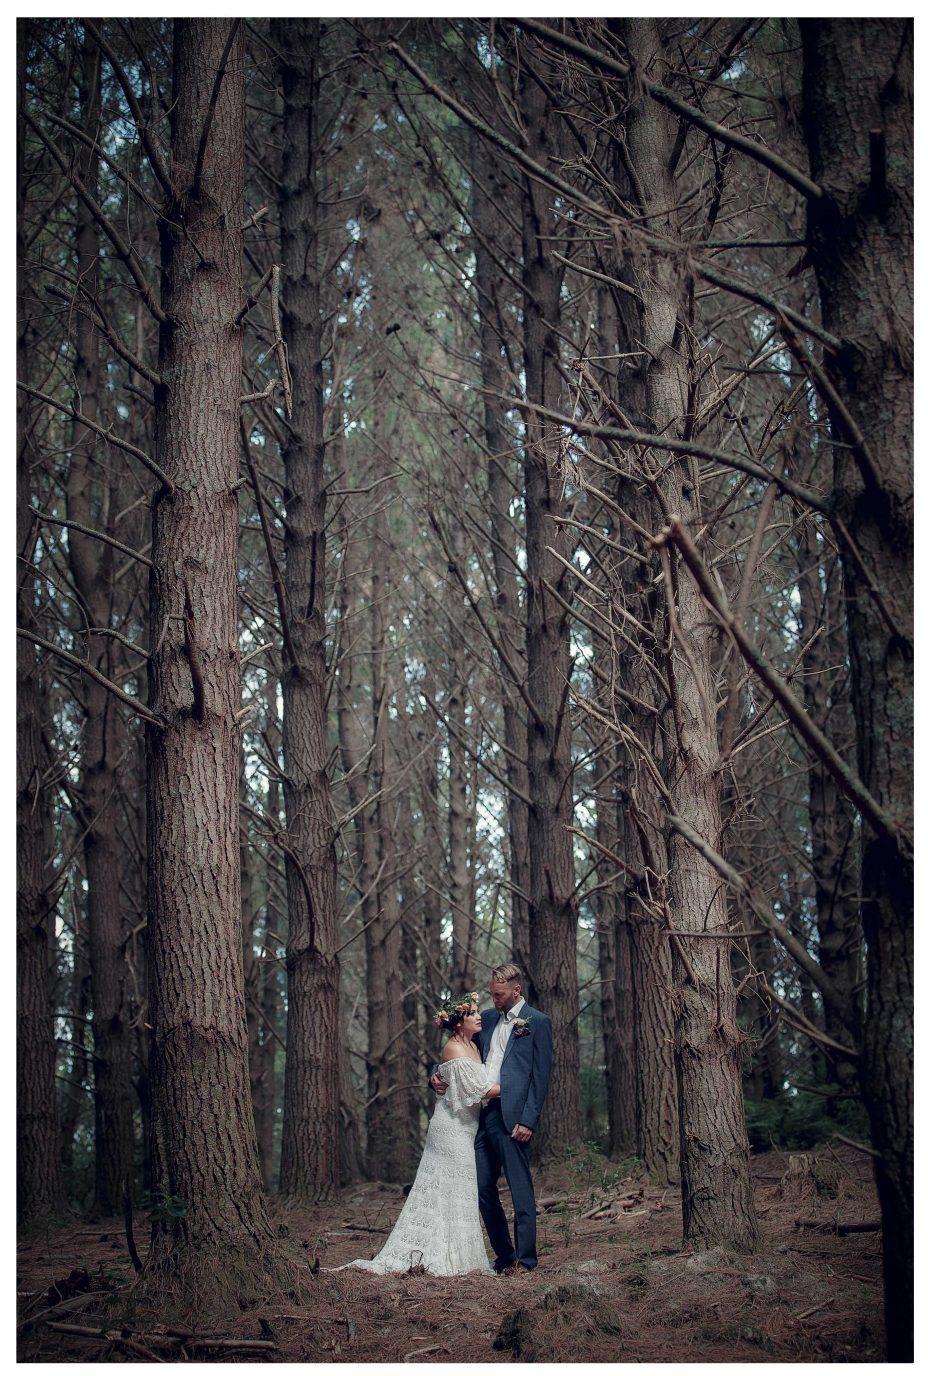 Bridal creative location weding photo, Bride and groom amoung huge trees, Riverhead Forrest wedding photo, Kumeu Valley